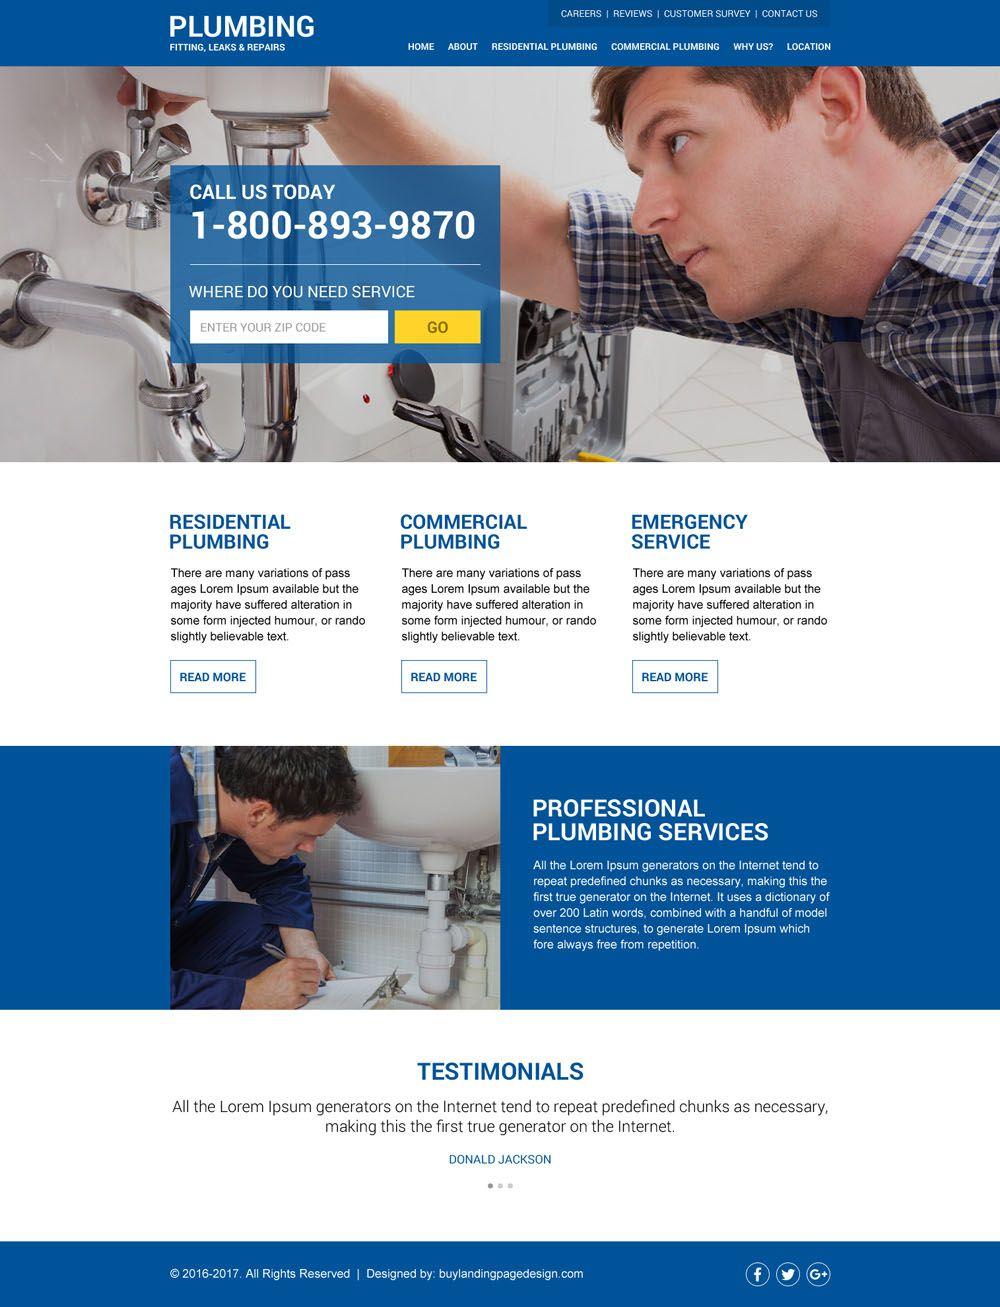 Plumbing Html Website Design Added To Buylandingpagedesign Com Buylandingpagedesign Com Website Design Plumbing Website Template Design